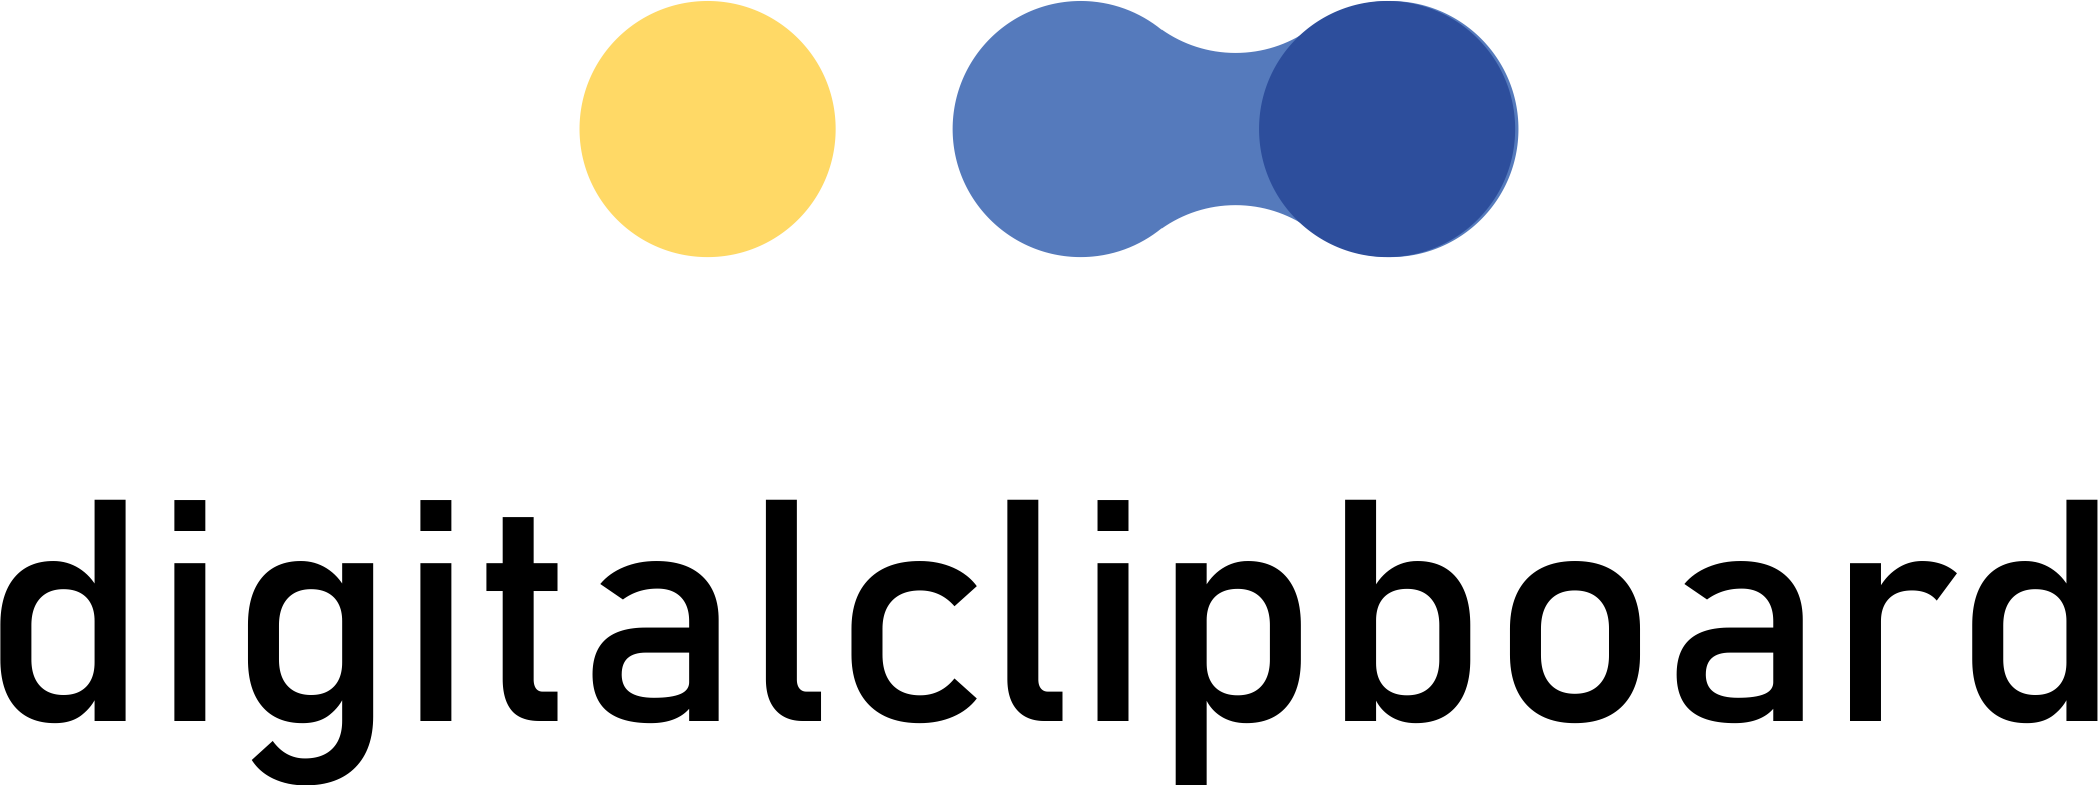 Digital Clipboard logo case studies goodish